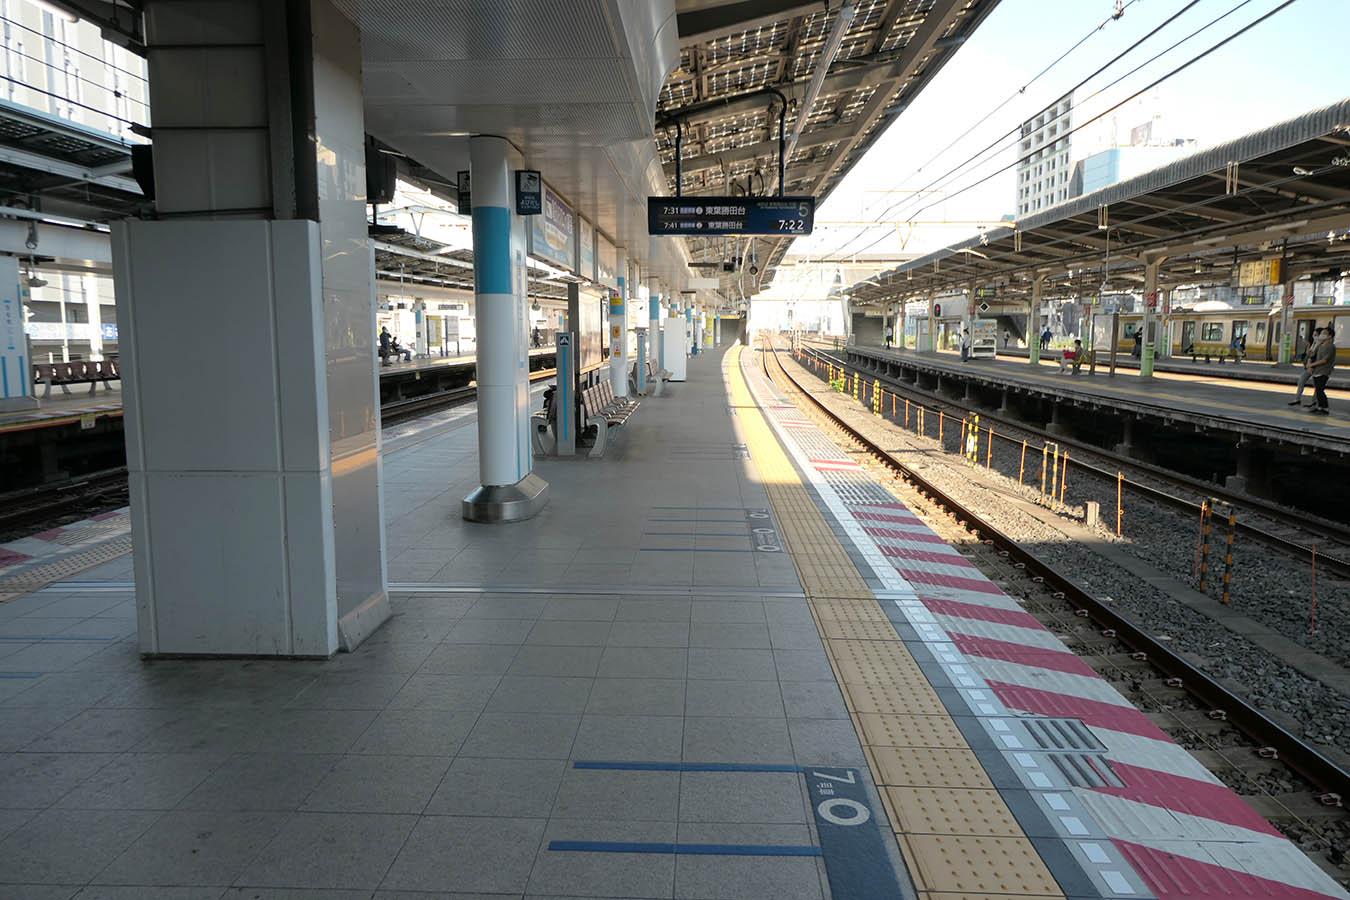 t23_photo02.jpg